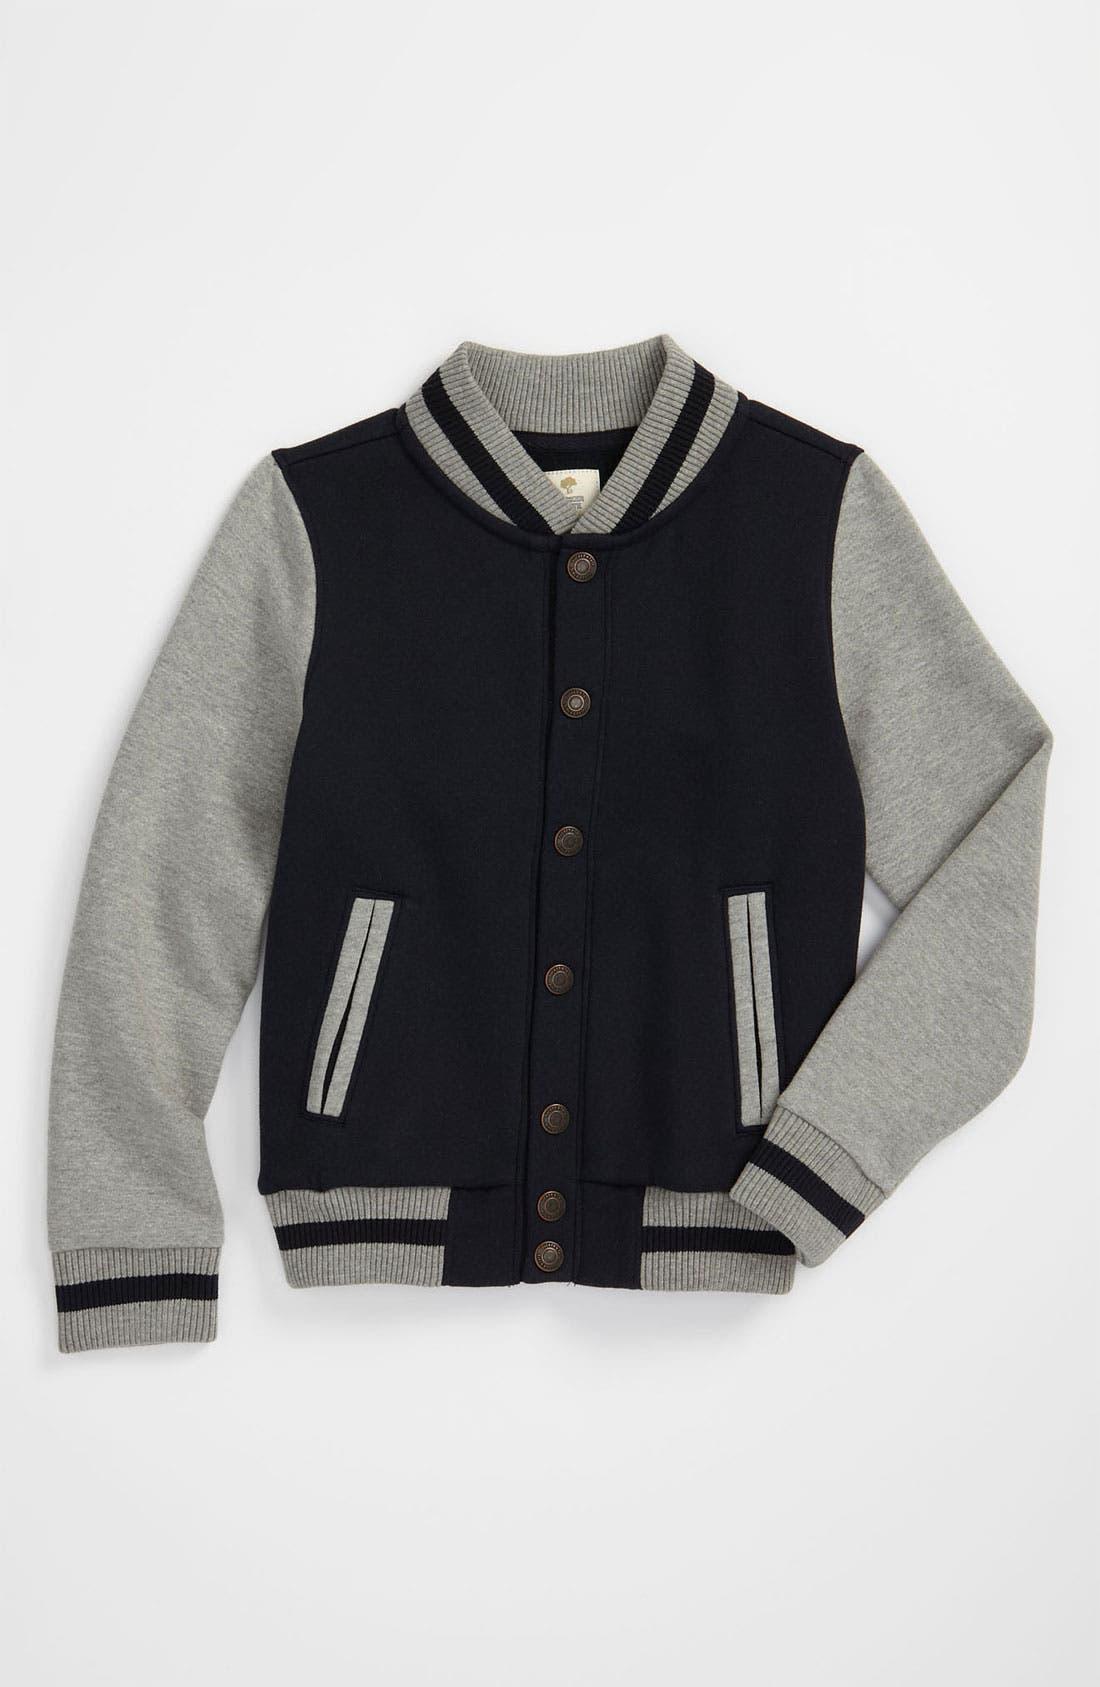 Alternate Image 1 Selected - Tucker + Tate 'Emmit' Varsity Jacket (Little Boys)